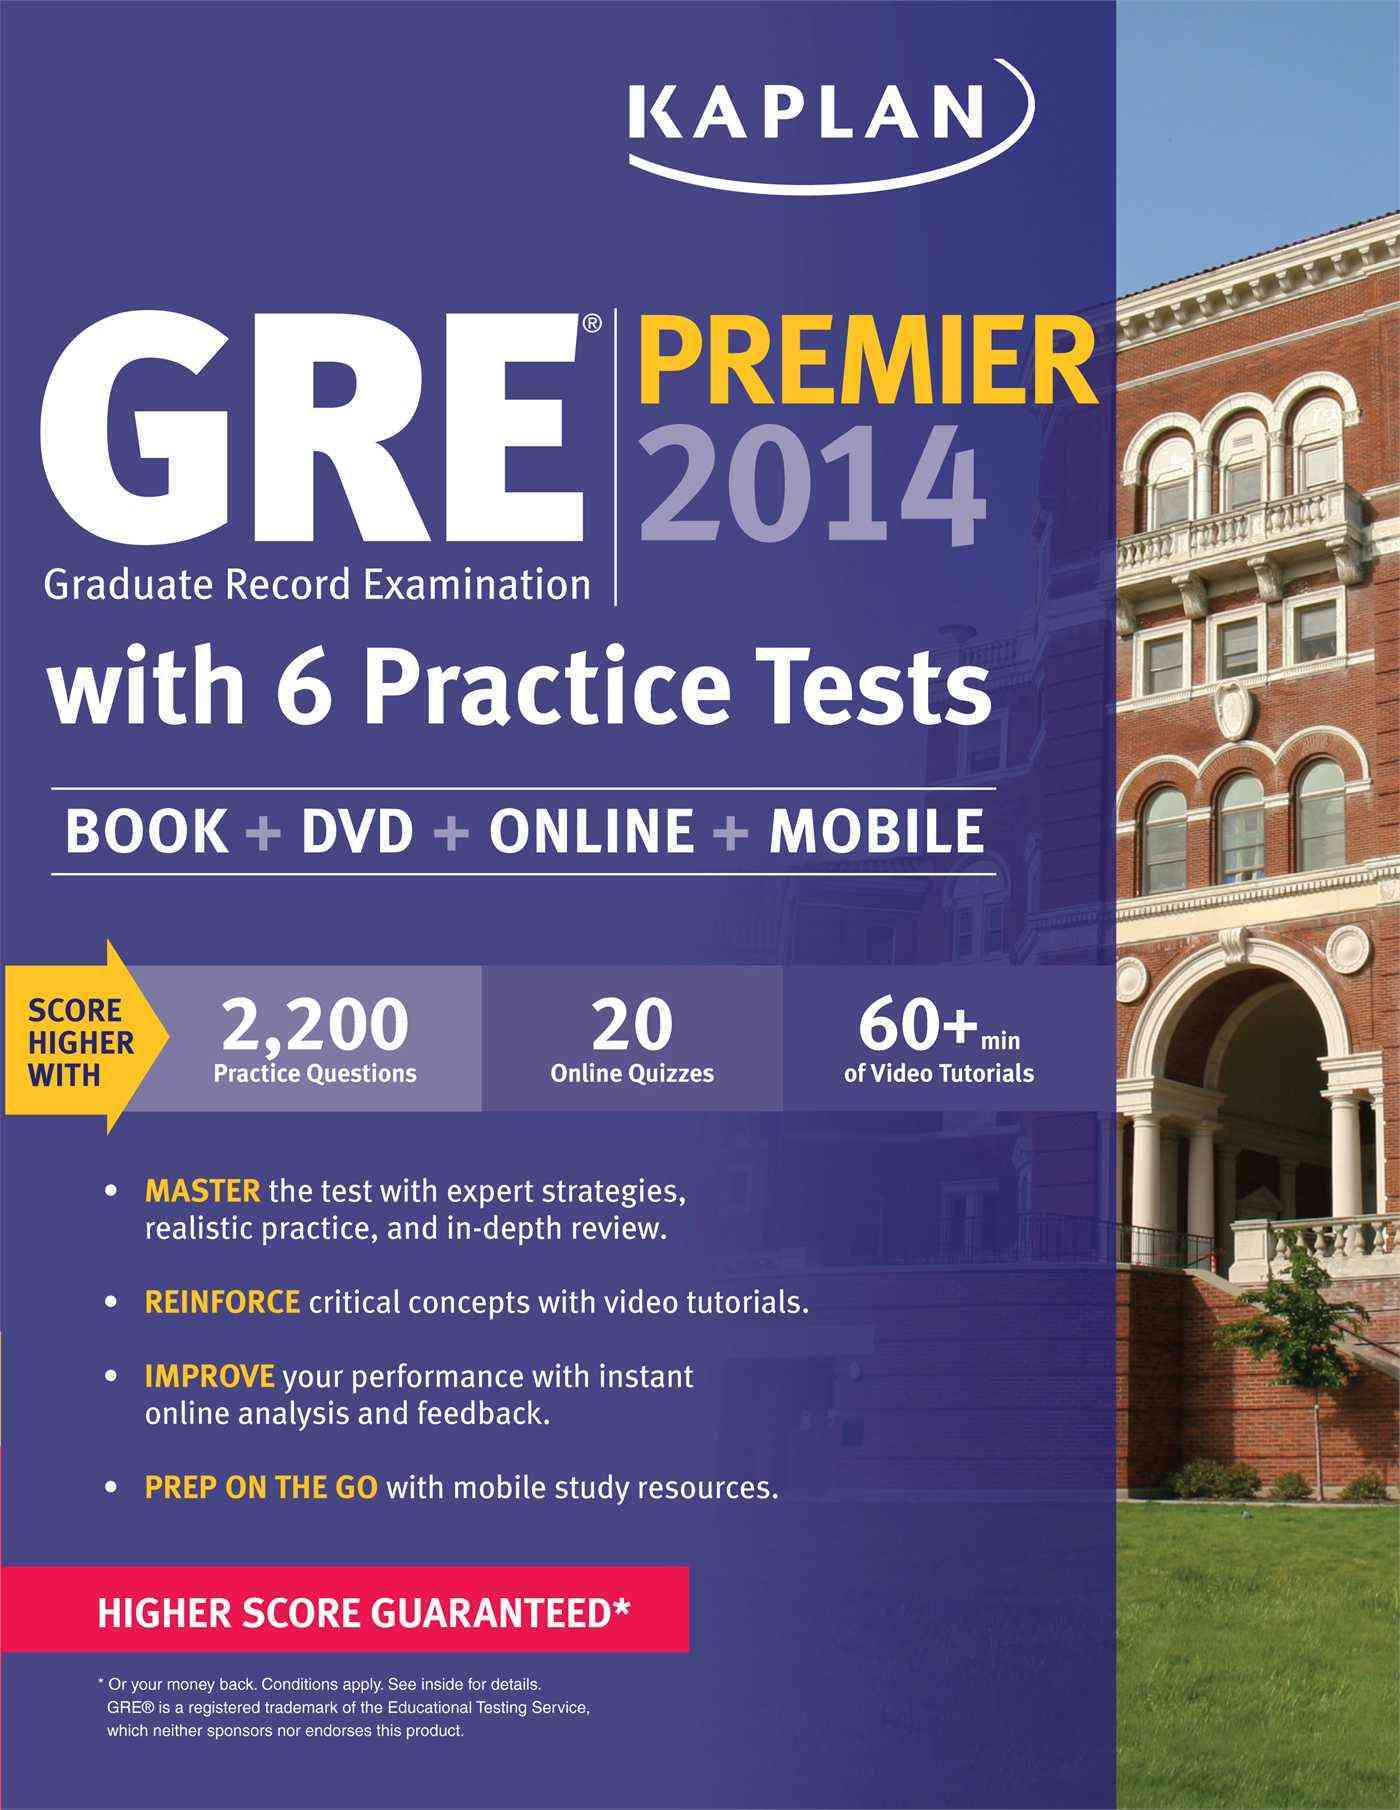 Kaplan GRE Premier 2014